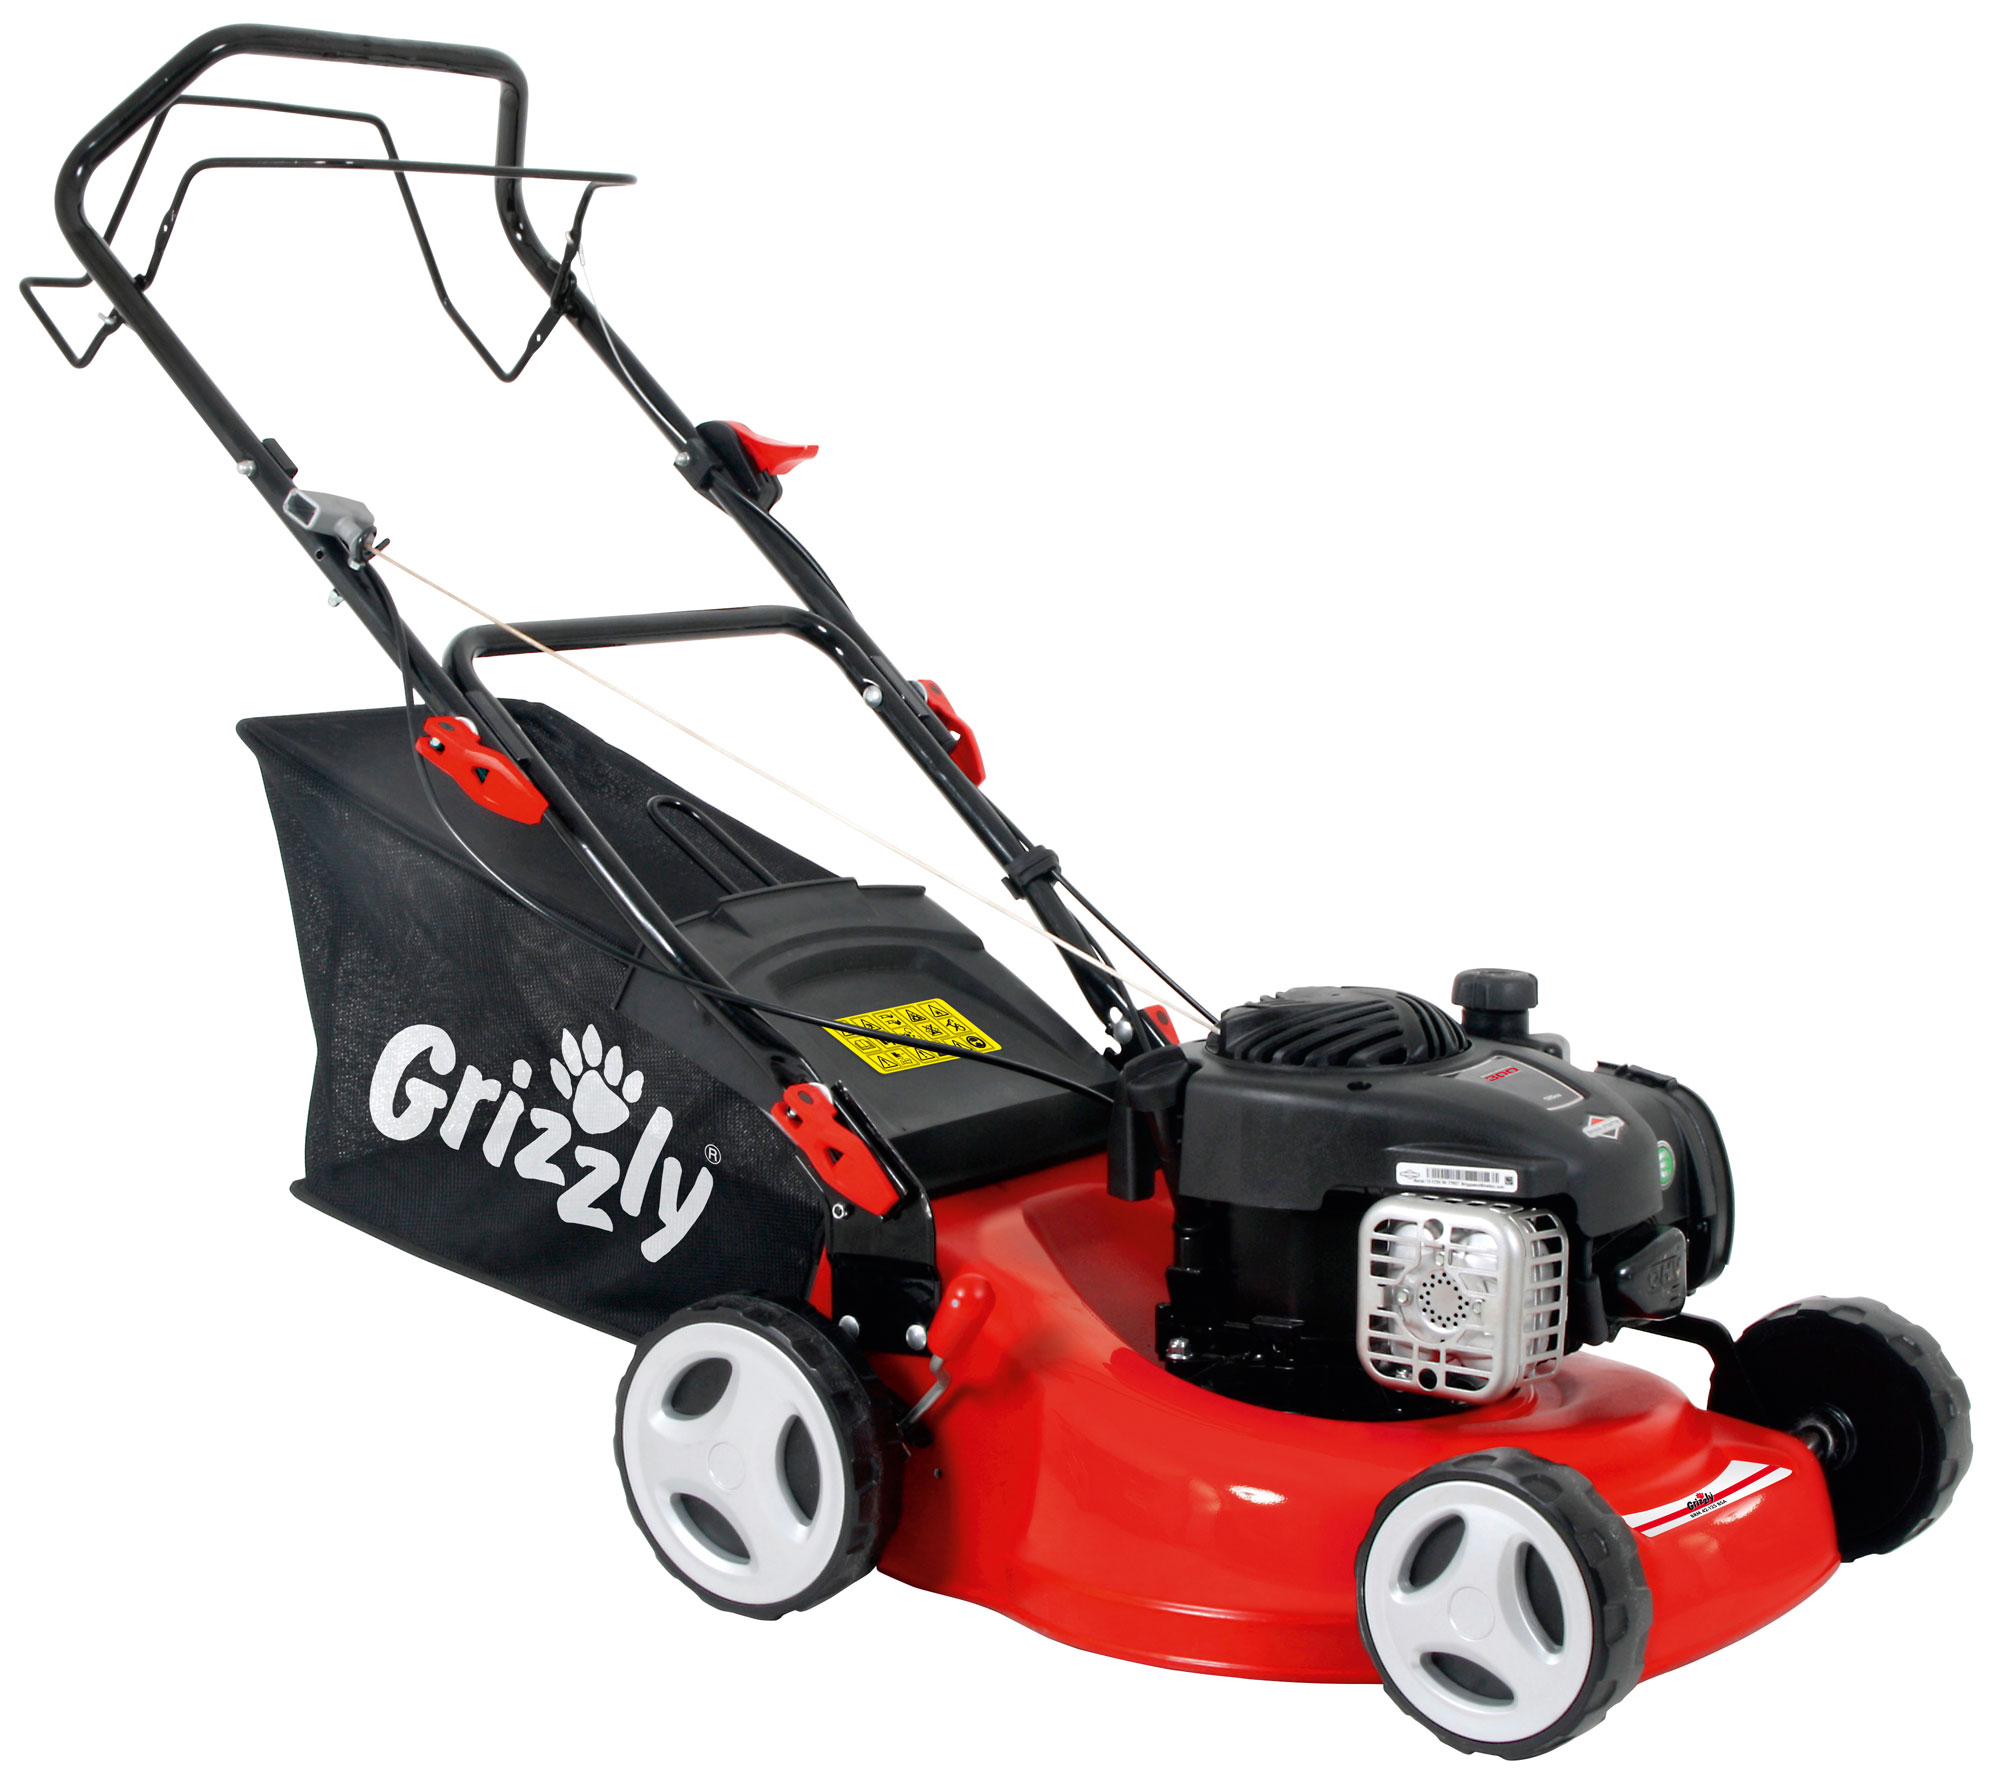 Benzin Rasenmäher Grizzly BRM 42 125 BSA mit B&S Motor 1,82kW SB 42cm Bild 1